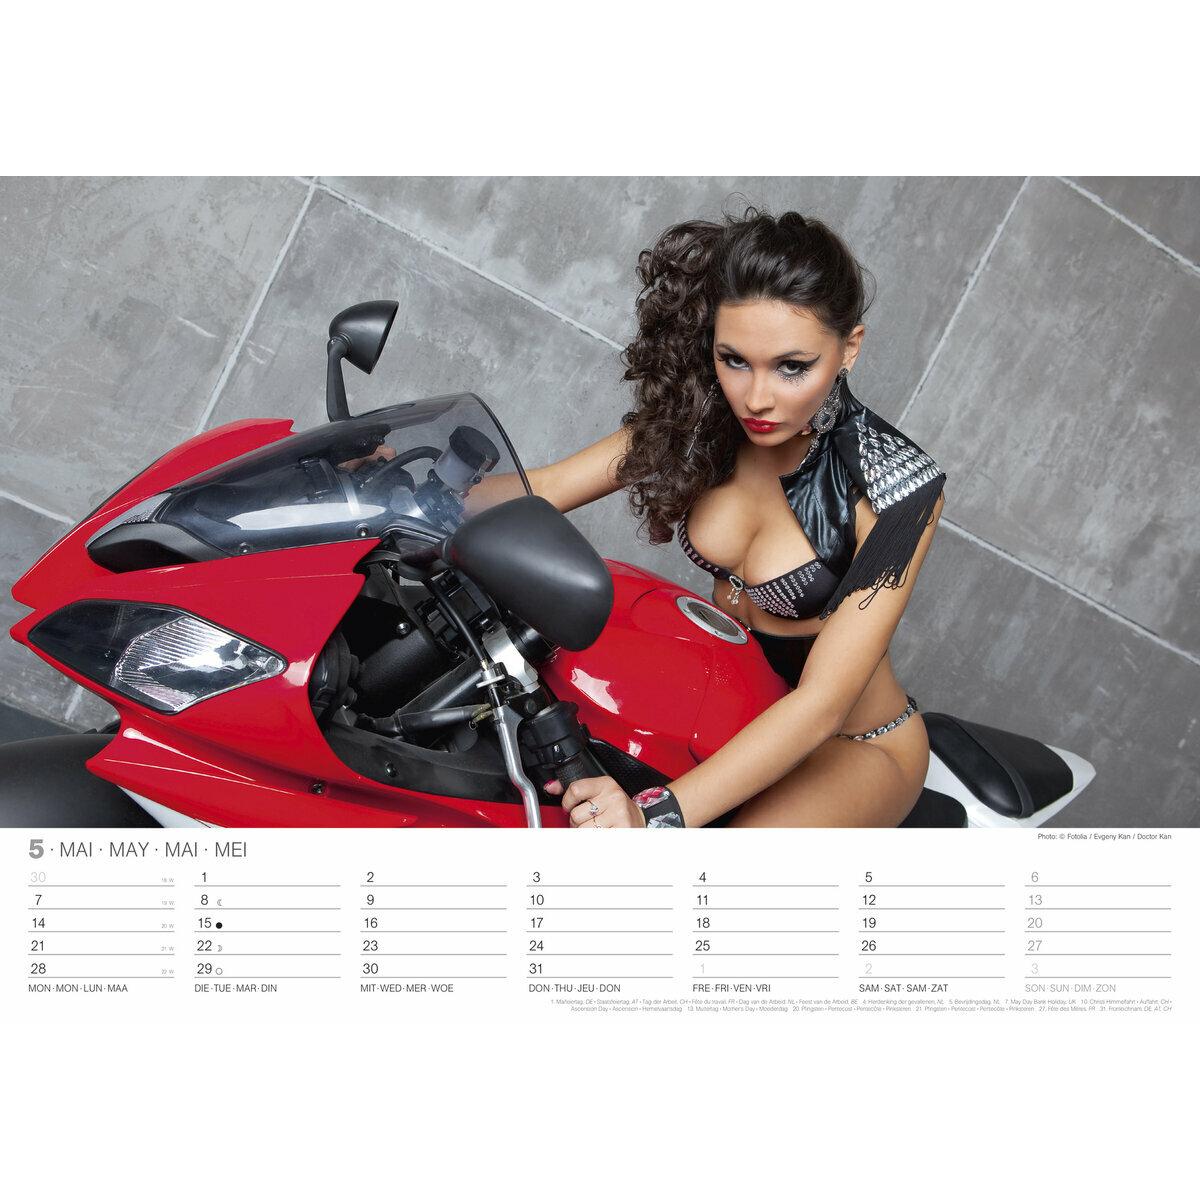 maxi calendrier 2018 sexy femme et moto. Black Bedroom Furniture Sets. Home Design Ideas